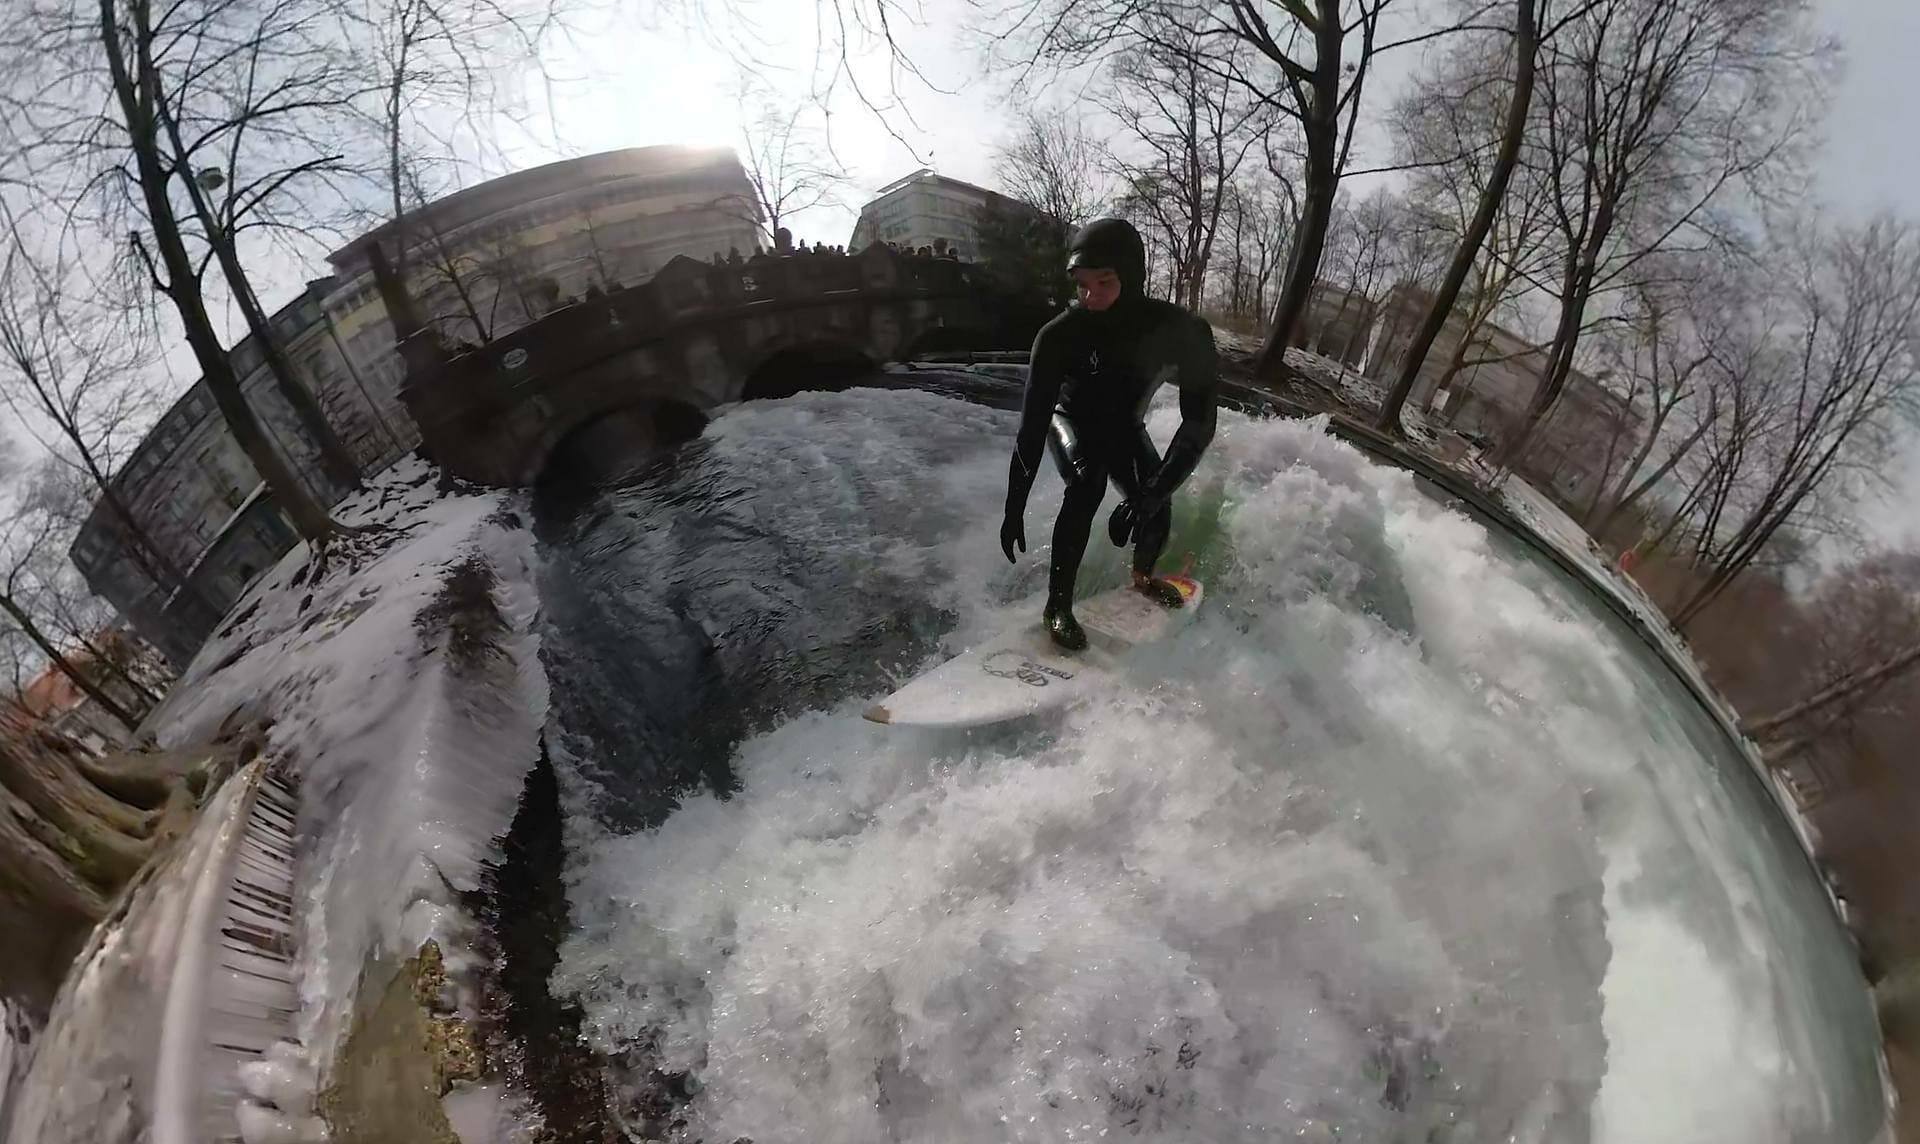 Eisbach Surfer 360° video